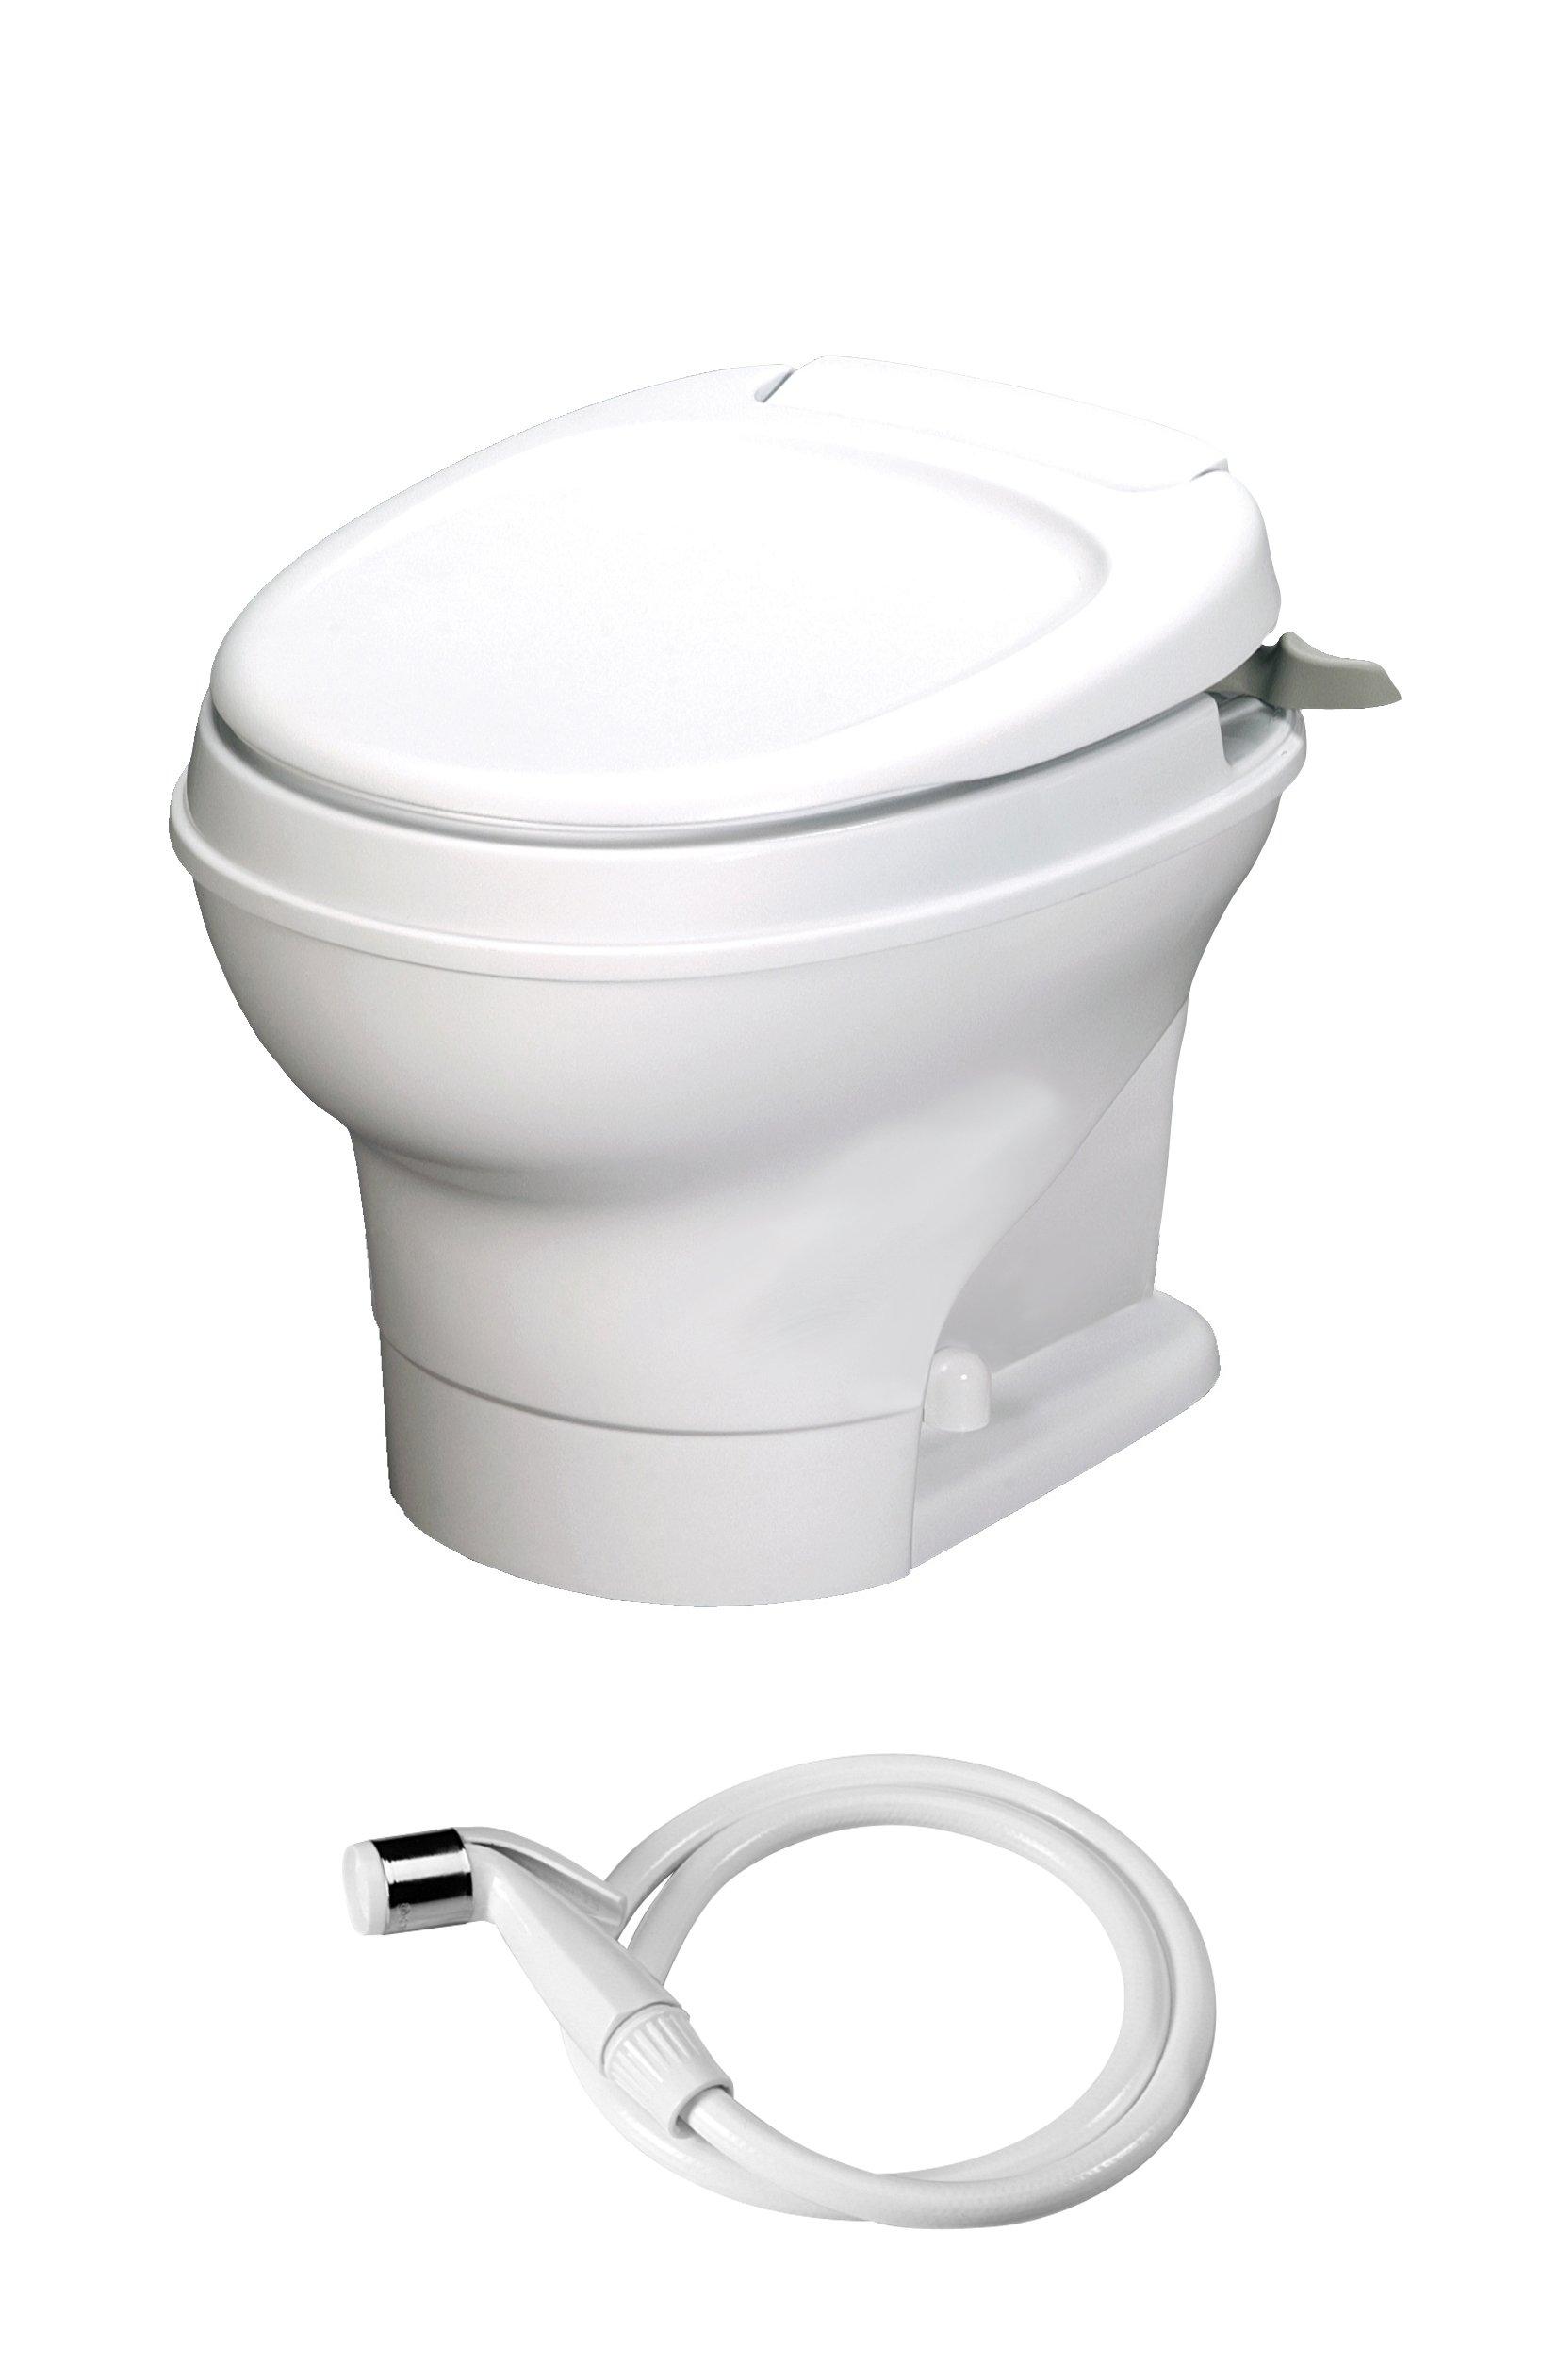 Aqua-Magic V RV Toilet Hand Flush with Hand Sprayer / Low Profile / White - Thetford 31657 by Thetford